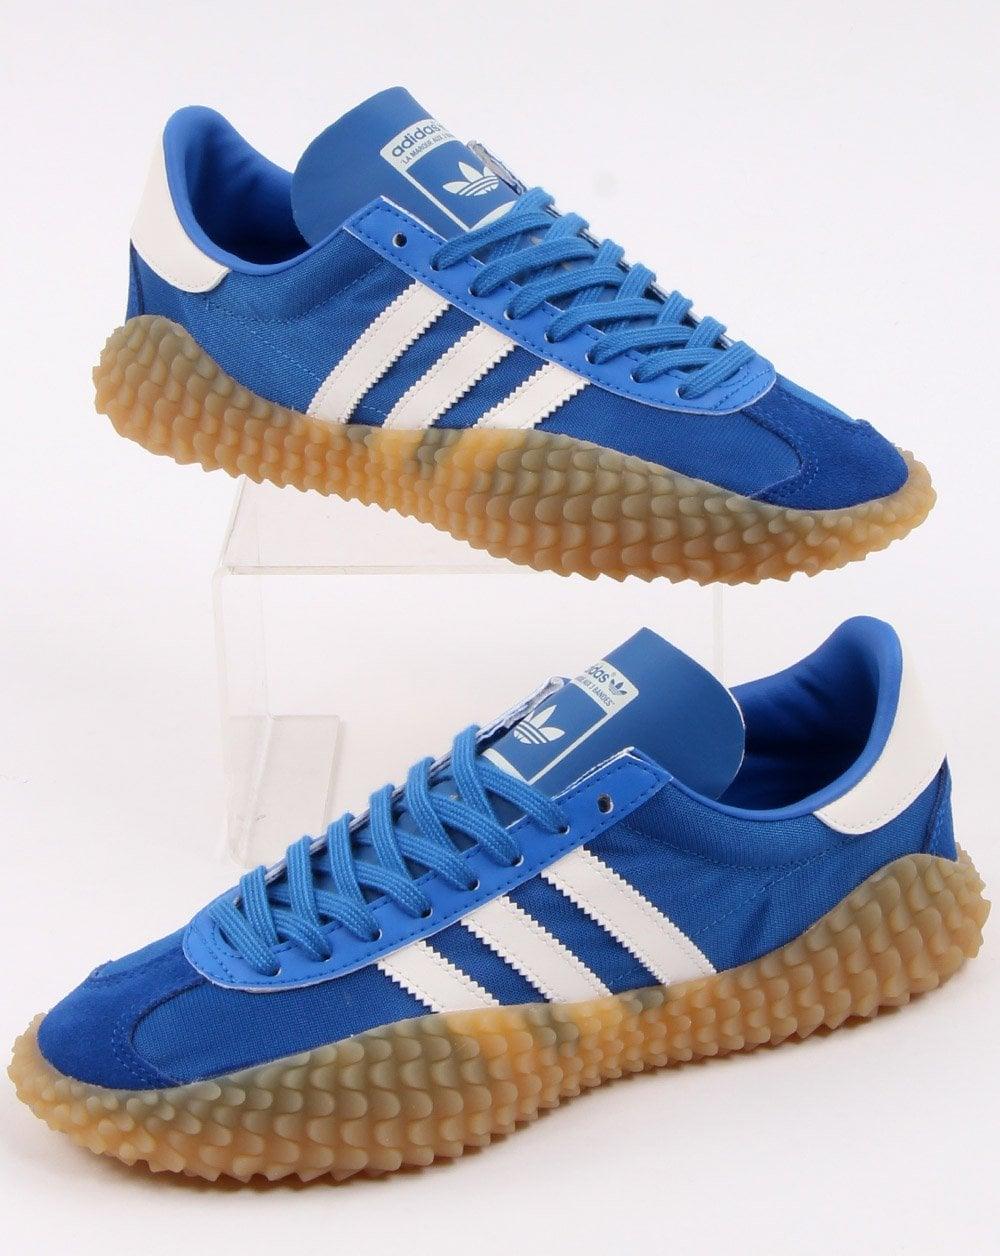 Adidas Country X Kamanda Trainers BlueCloud White